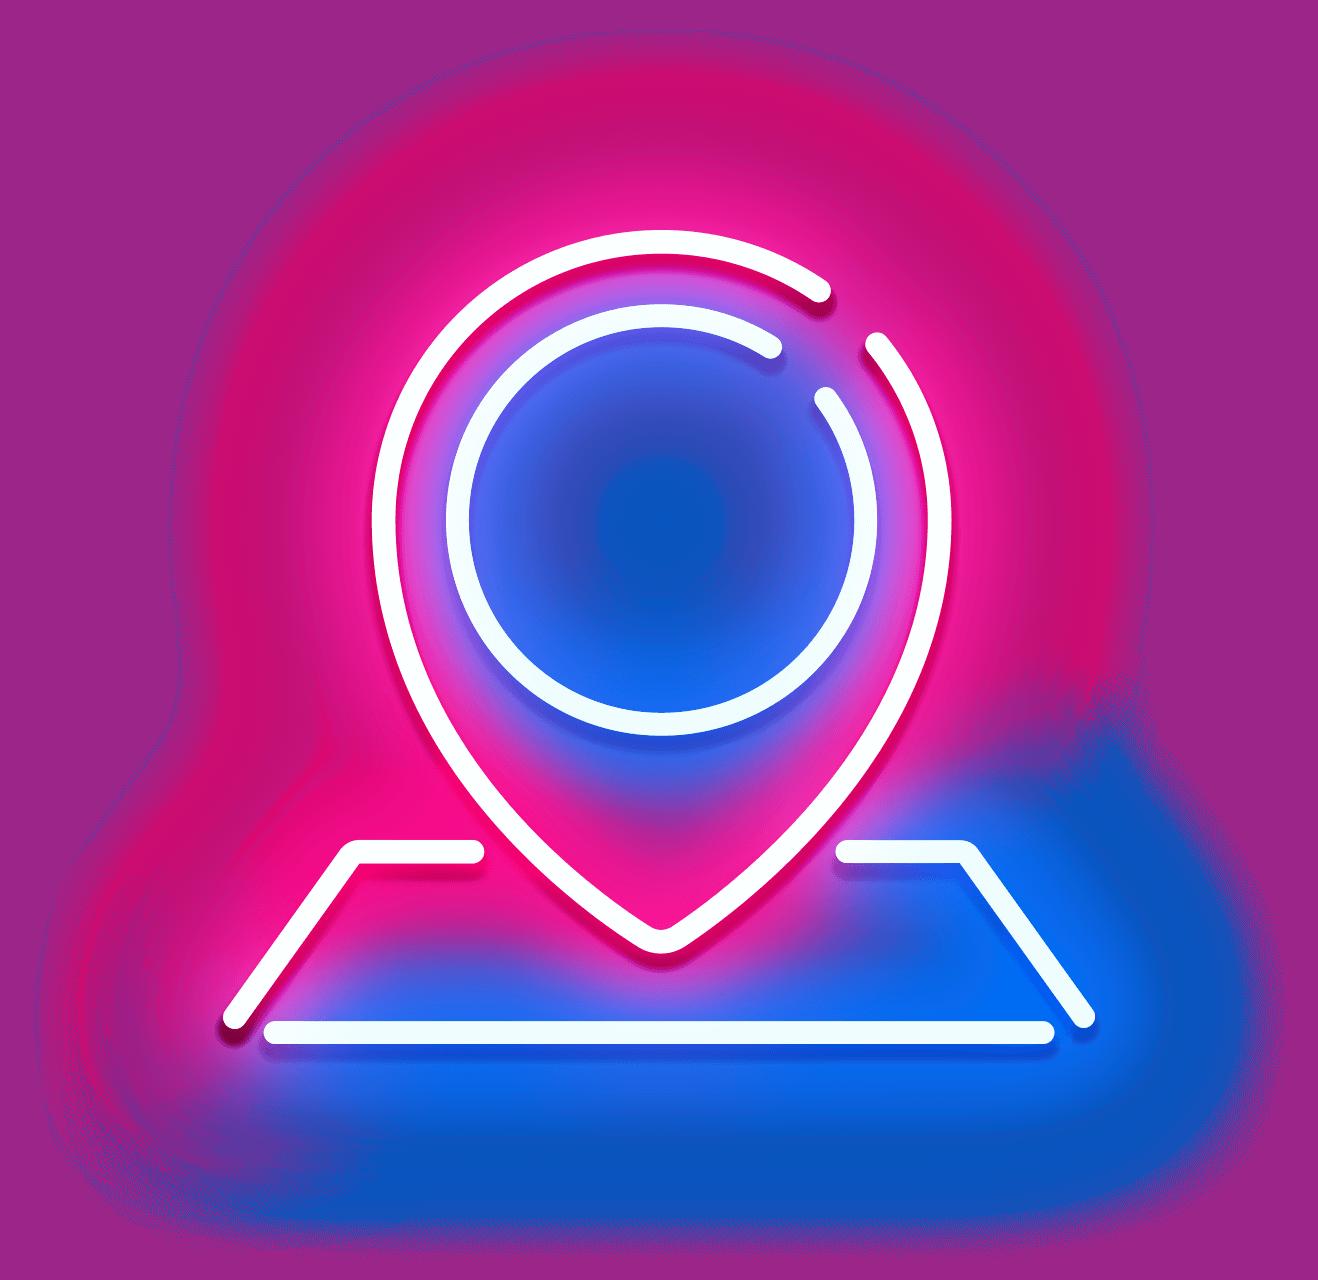 neon_pin@2x_72